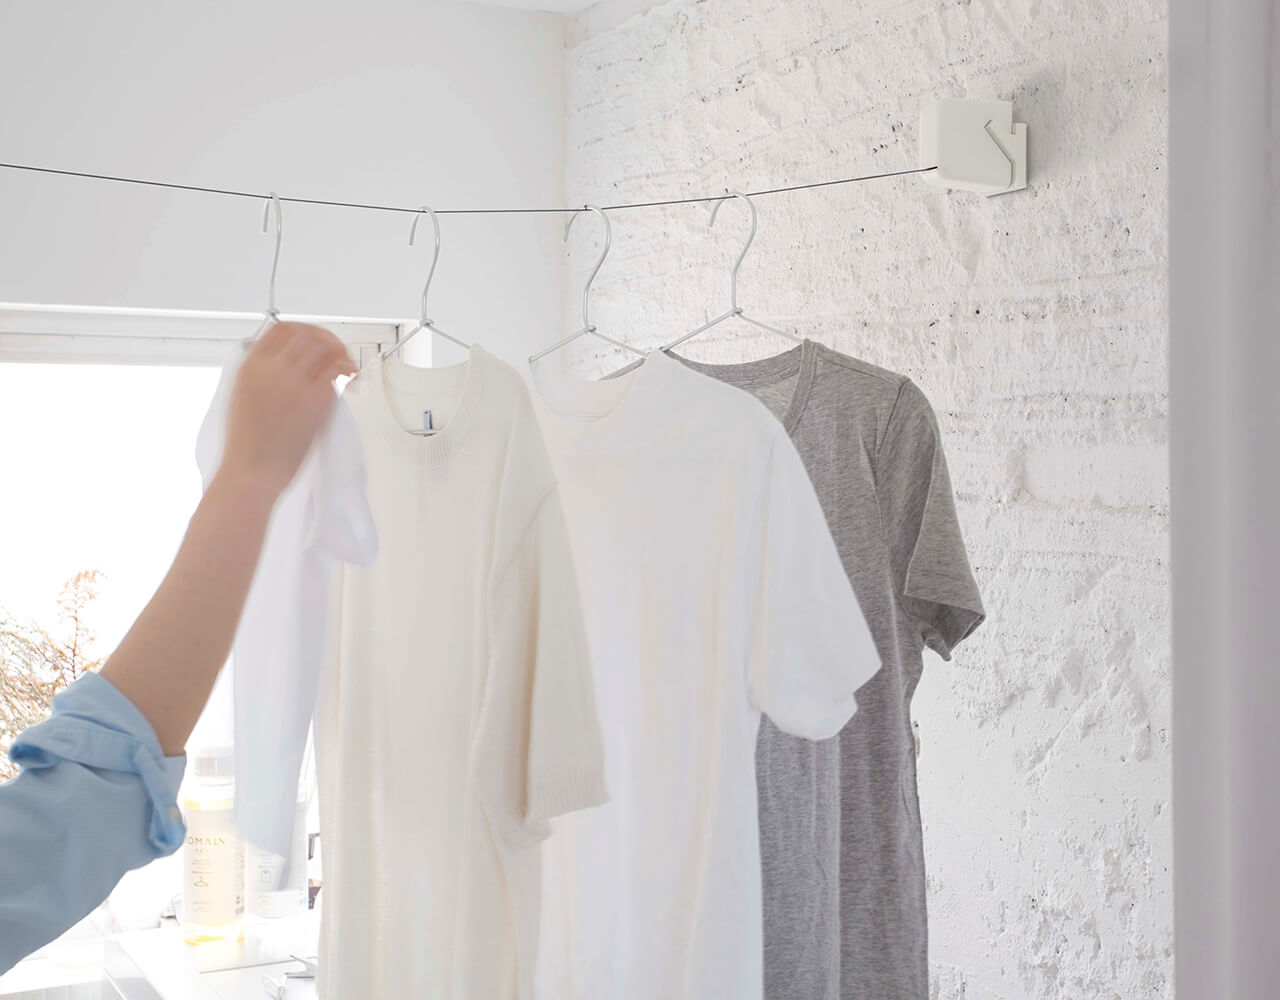 STOK laundry 室内物干しロープ¥5280/森田アルミ工業